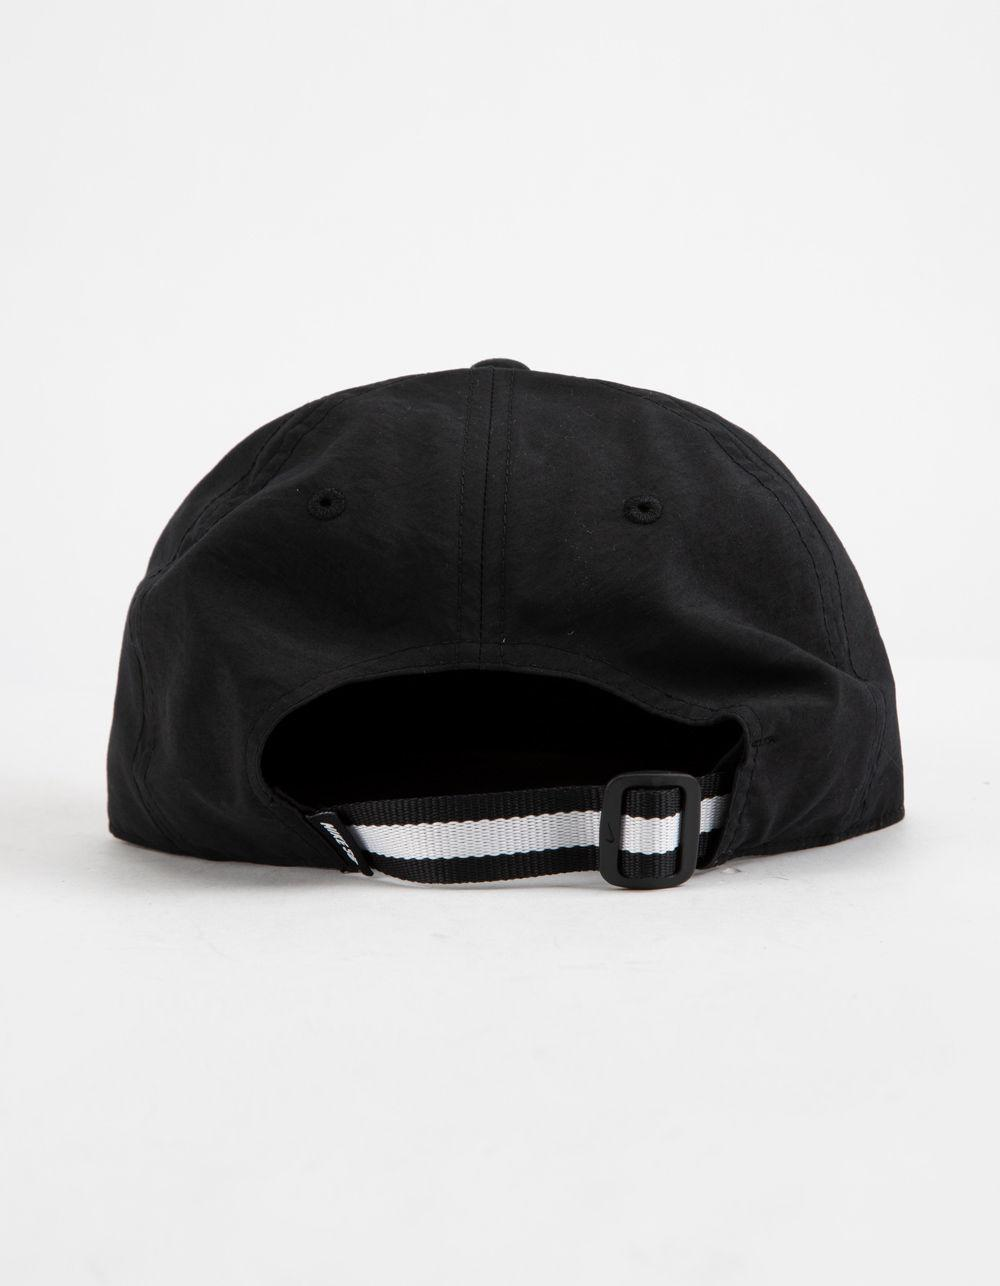 490eaba603bae Nike Dri-fit Heritage 86 Flat Black Combo Mens Strapback Hat in ...